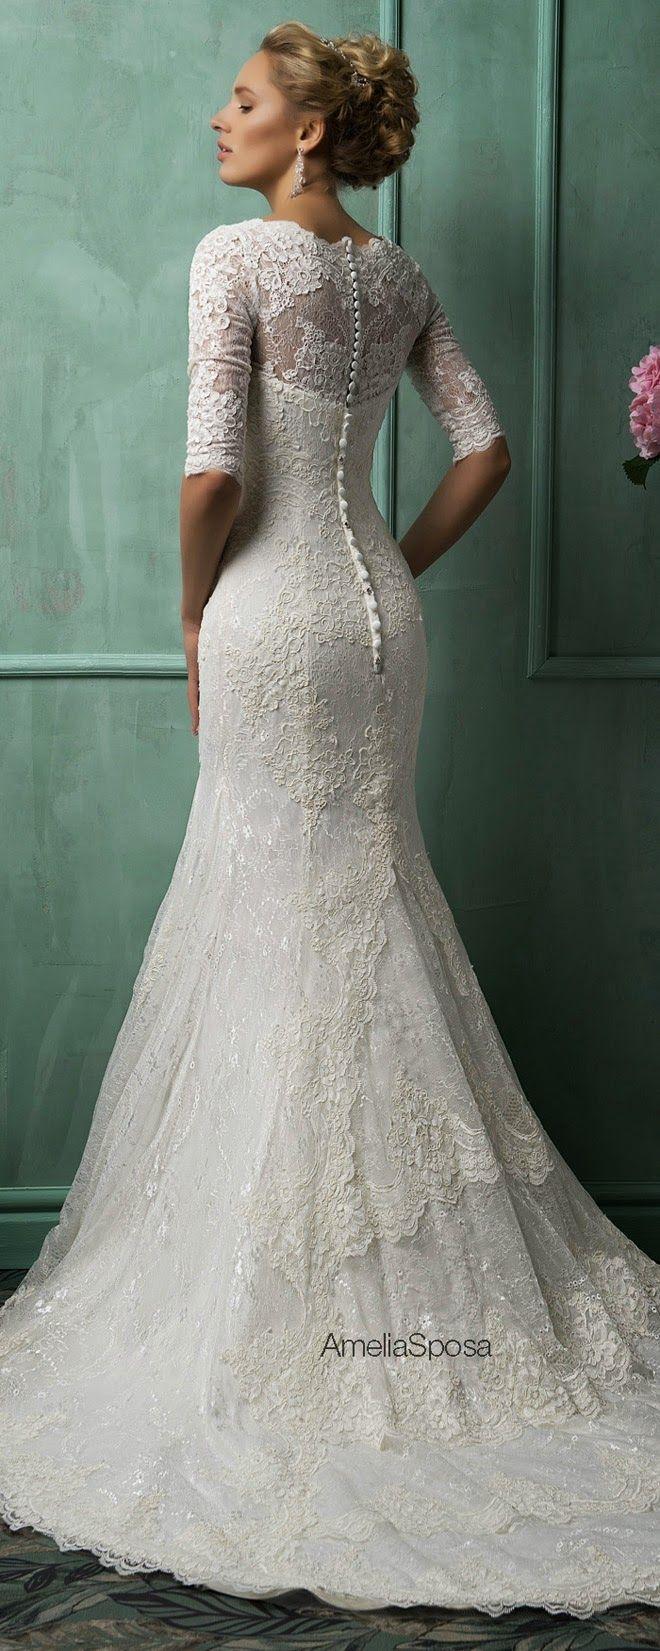 Marisa wedding dress   best Weddings idea images on Pinterest  Gown wedding Wedding